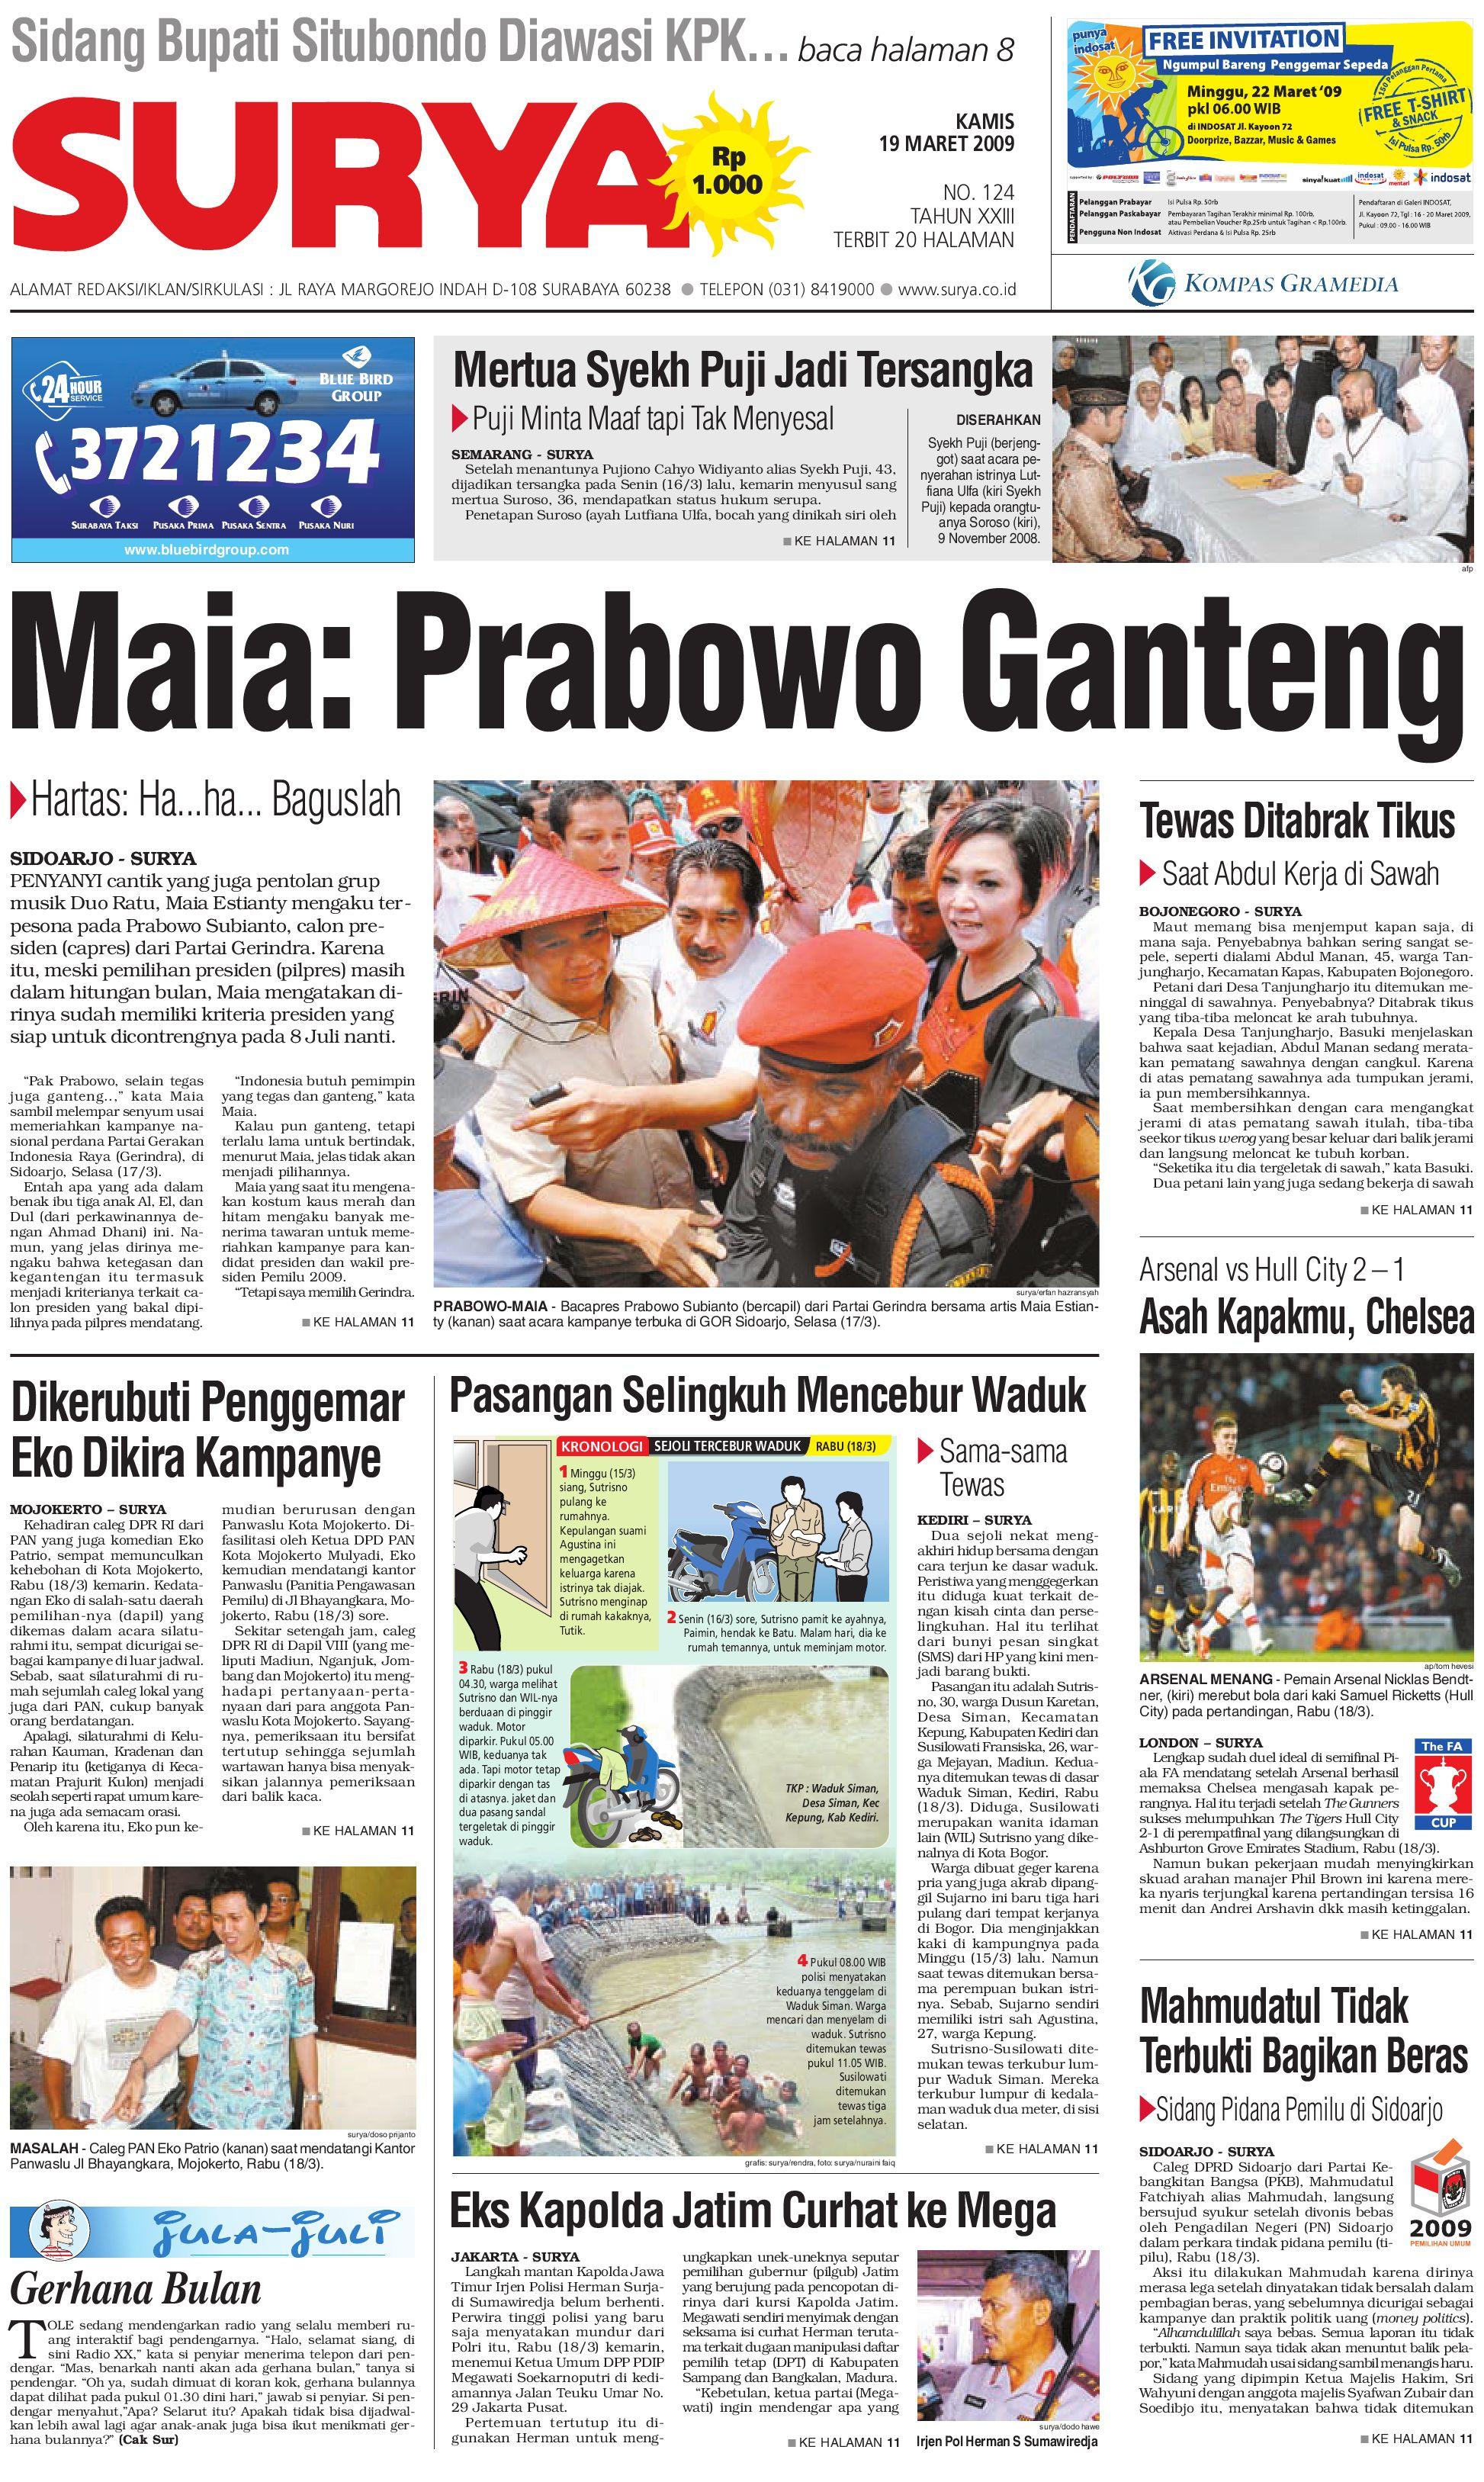 Surya Edisi Cetak 19 Maret 2009 By Harian Issuu Produk Ukm Bumn Tekiro Tang Kombinasi 7